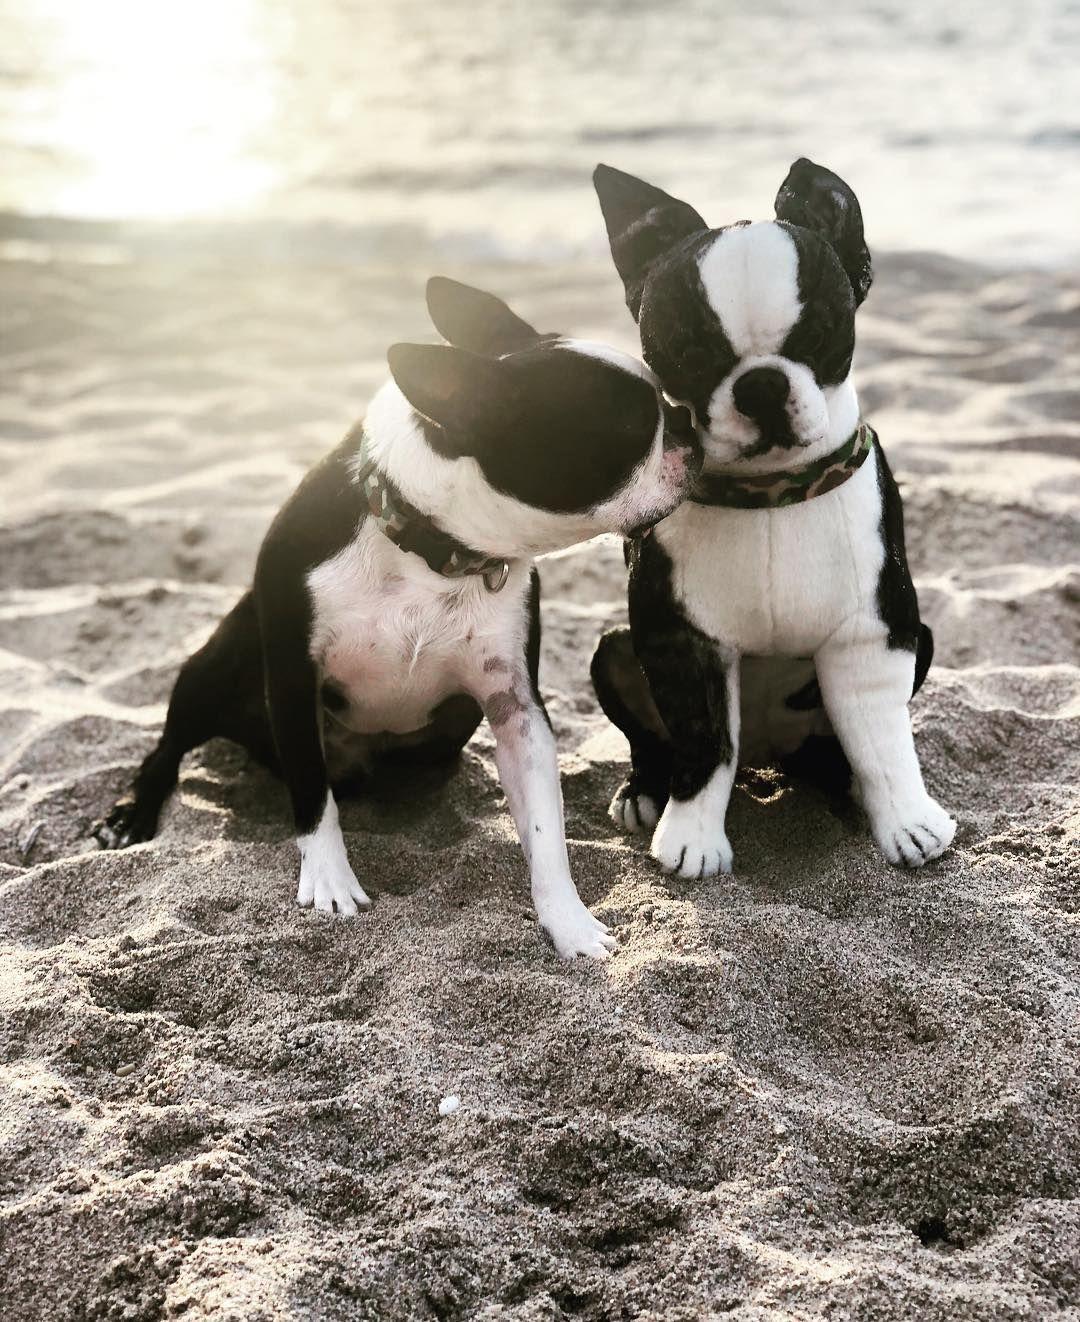 Stuffed Animal Of Your Pet Pet Plush Petsies Custom Stuffed Animal Boston Terrier Love Boston Terrier